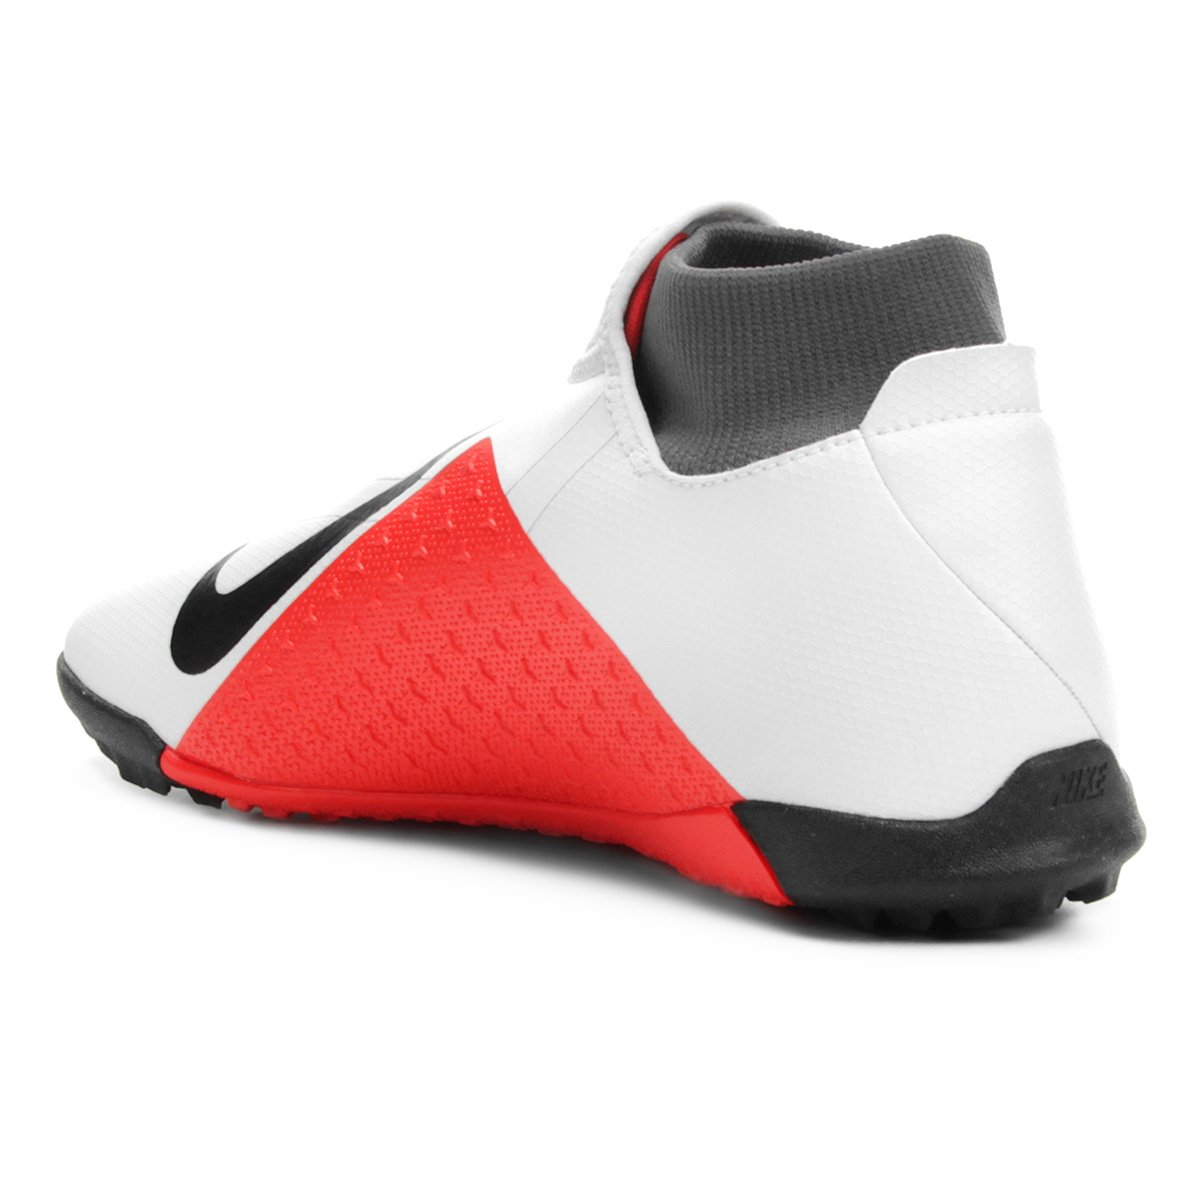 Nike Phantom VSN Academy DF IC Indoor Soccer Shoes eBay